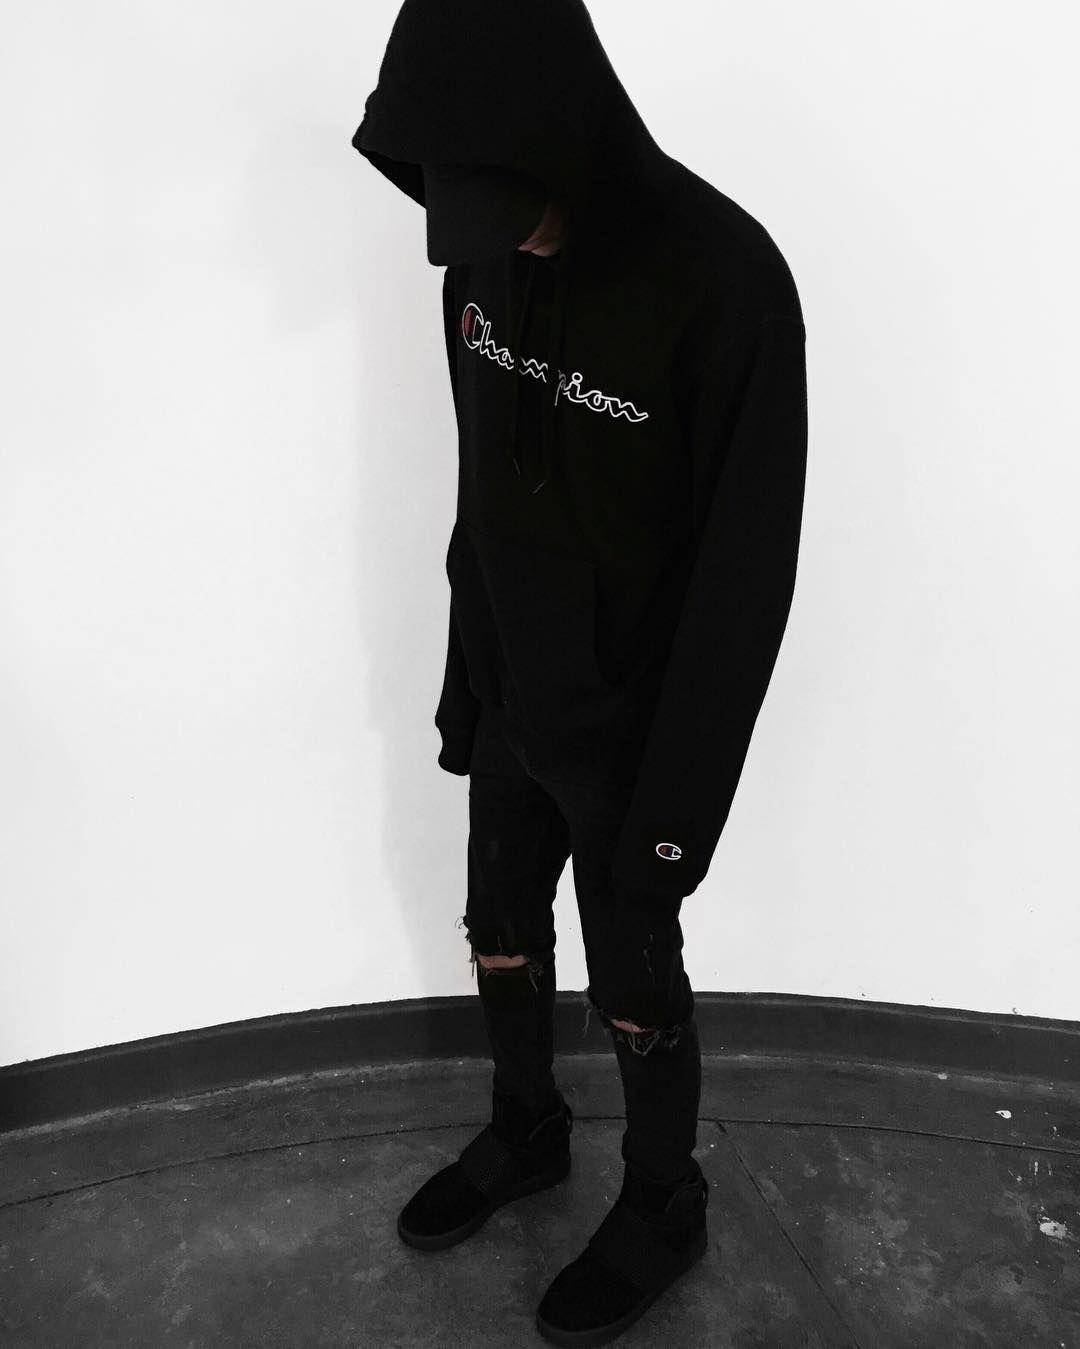 Adidas Tubular Invader Instagram